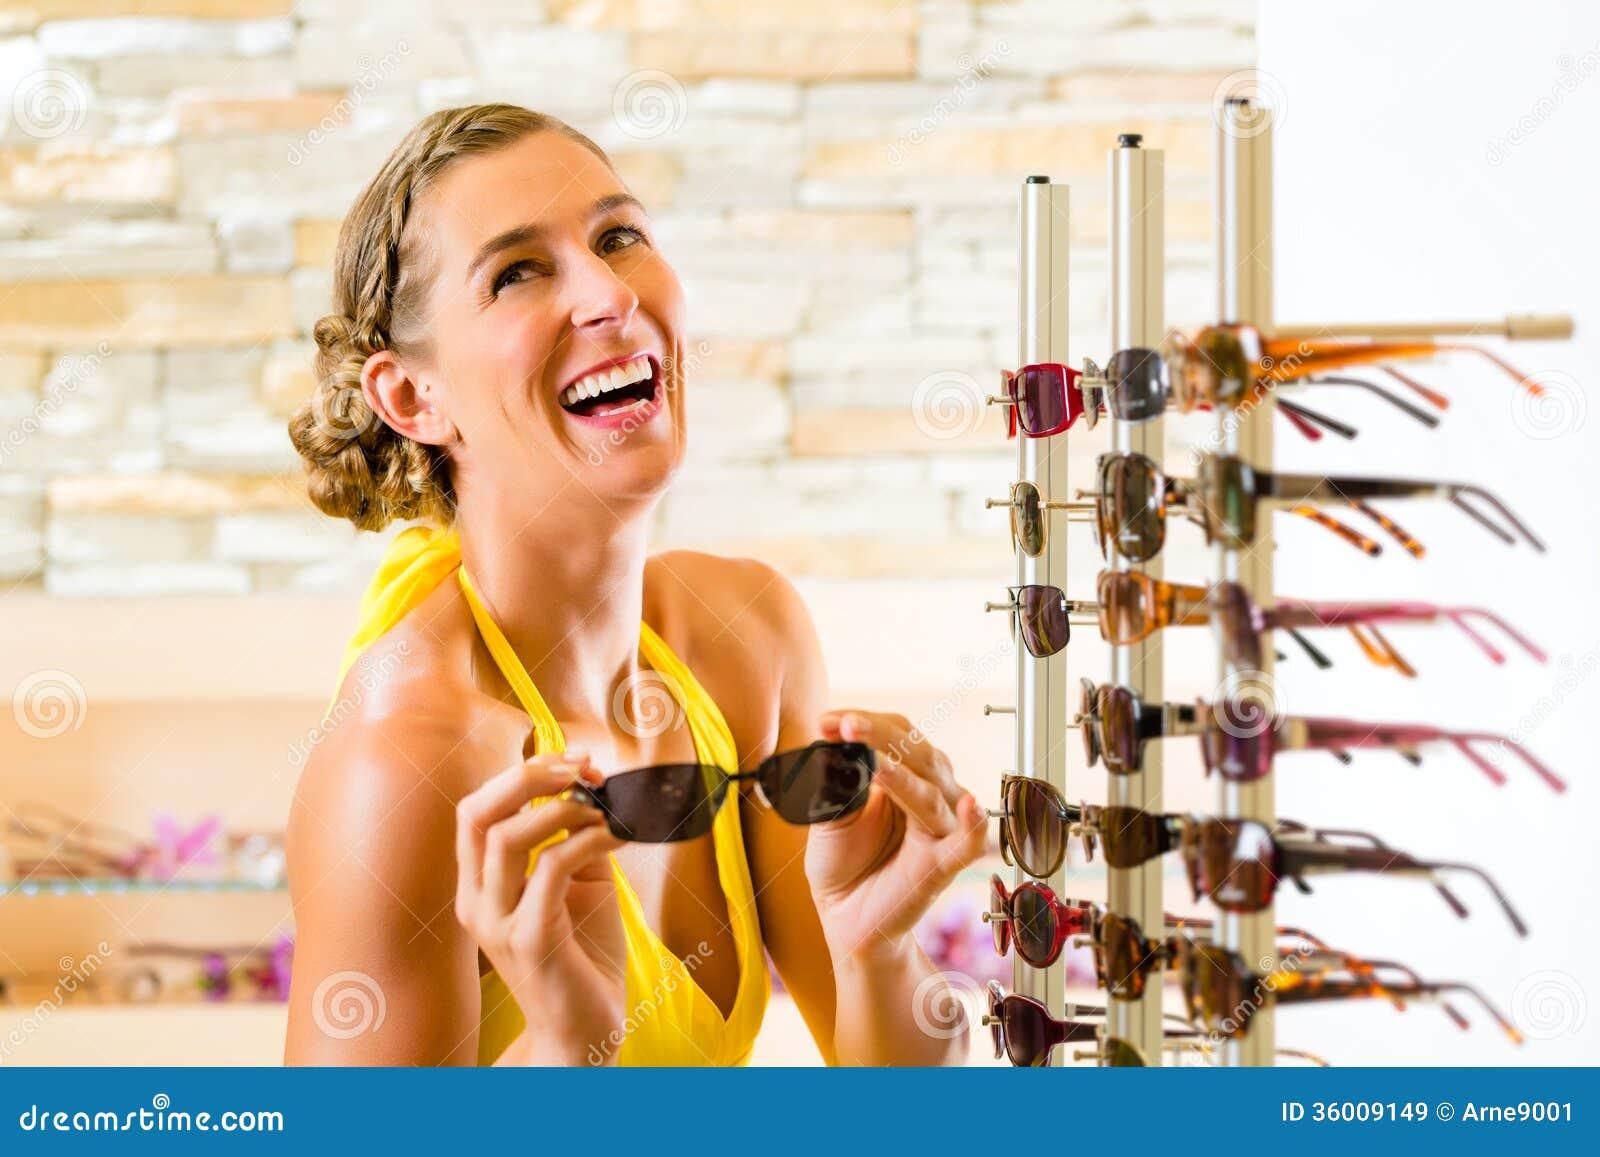 Young woman at optician shopping sunglasses